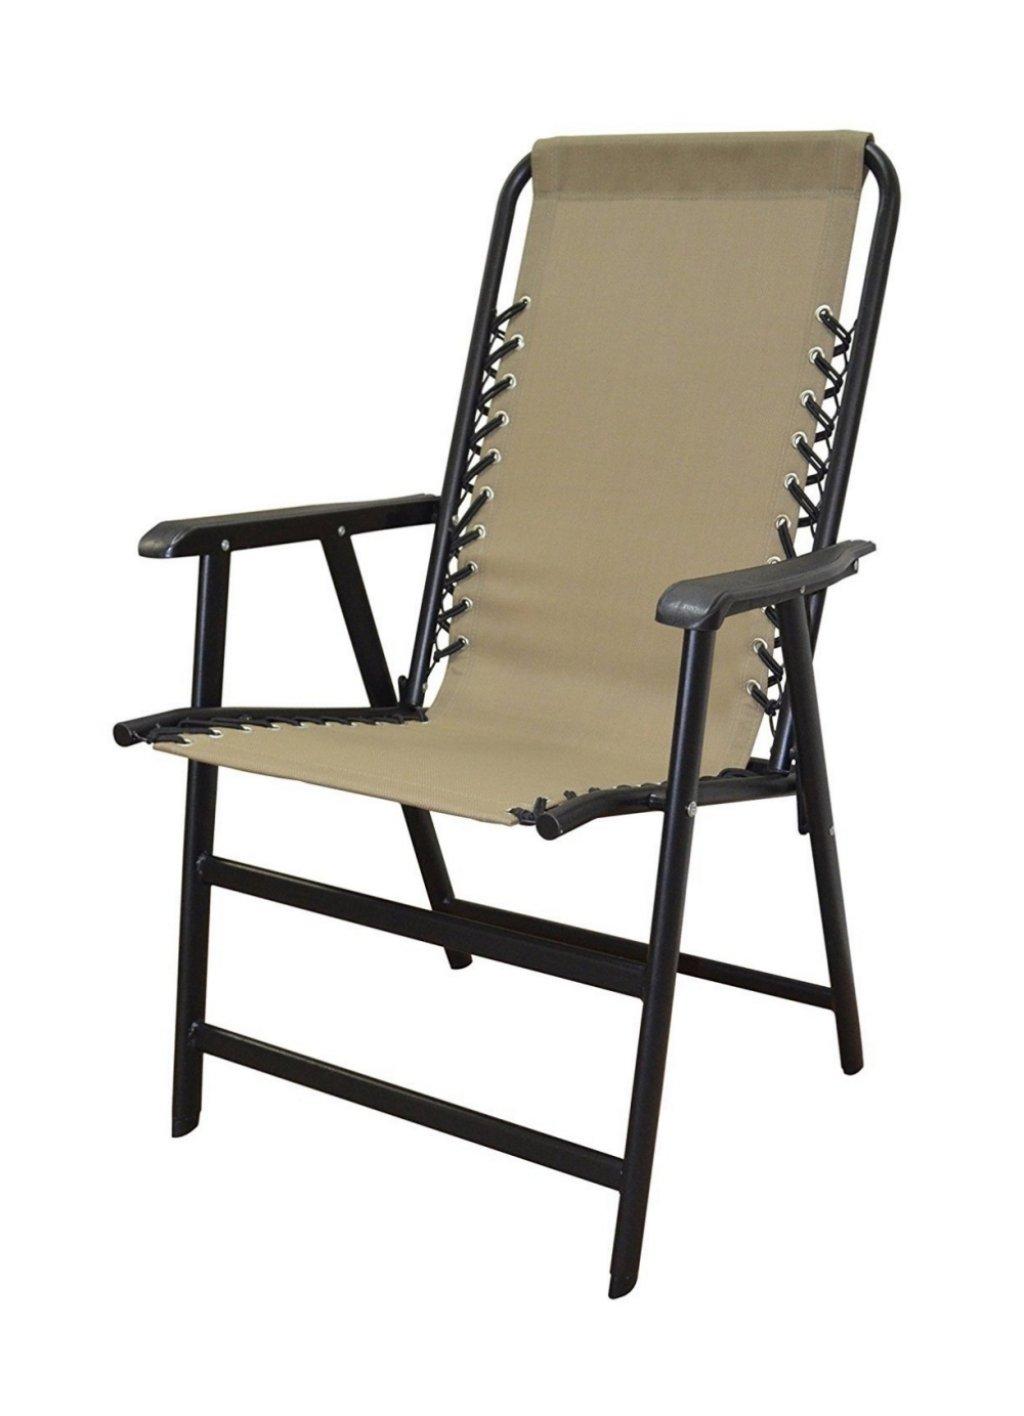 koonlert14 Outdoor Patio Folding Double Bungee System Chair Sturdy Steel Frame Lightweight Comfortable Durable Textaline Fabric Porch Garden Furniture - Beige #1940